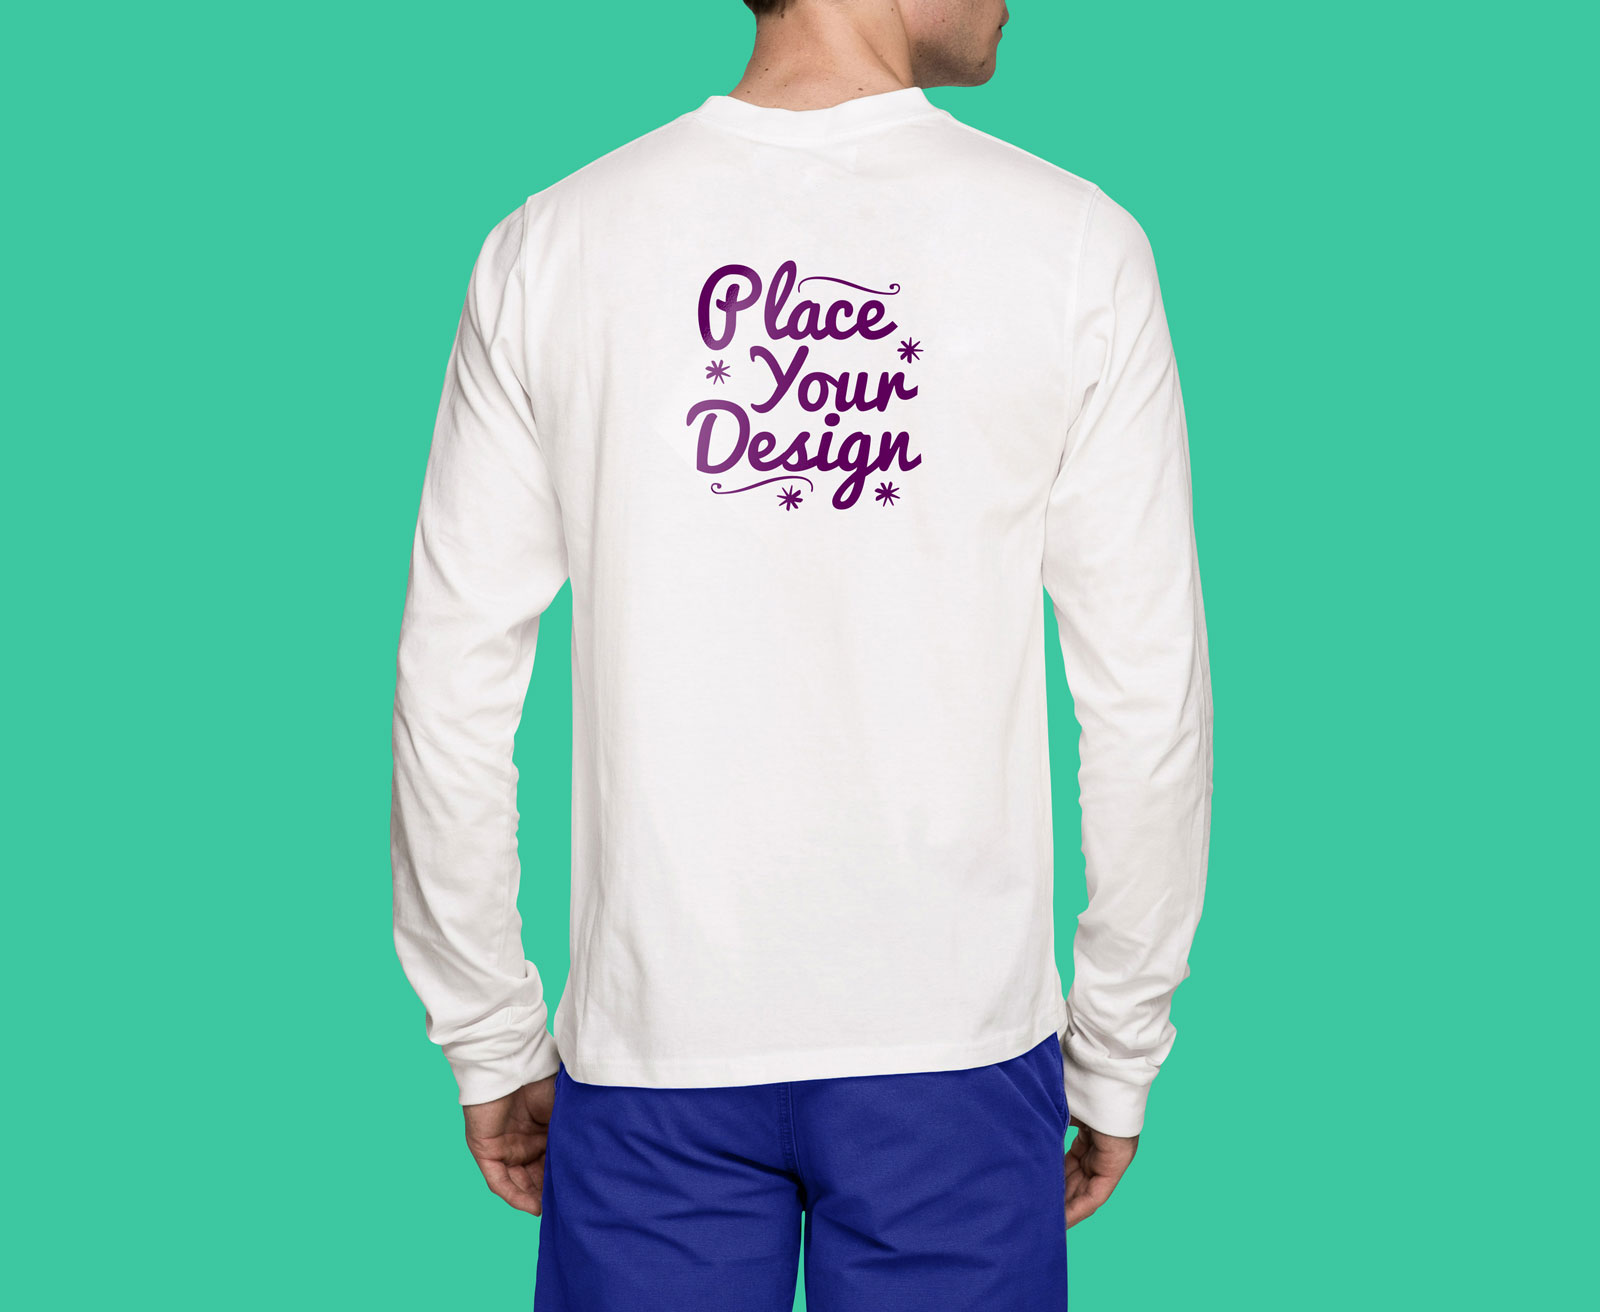 Free Backside White Long Sleeves T Shirt Mockup PSD